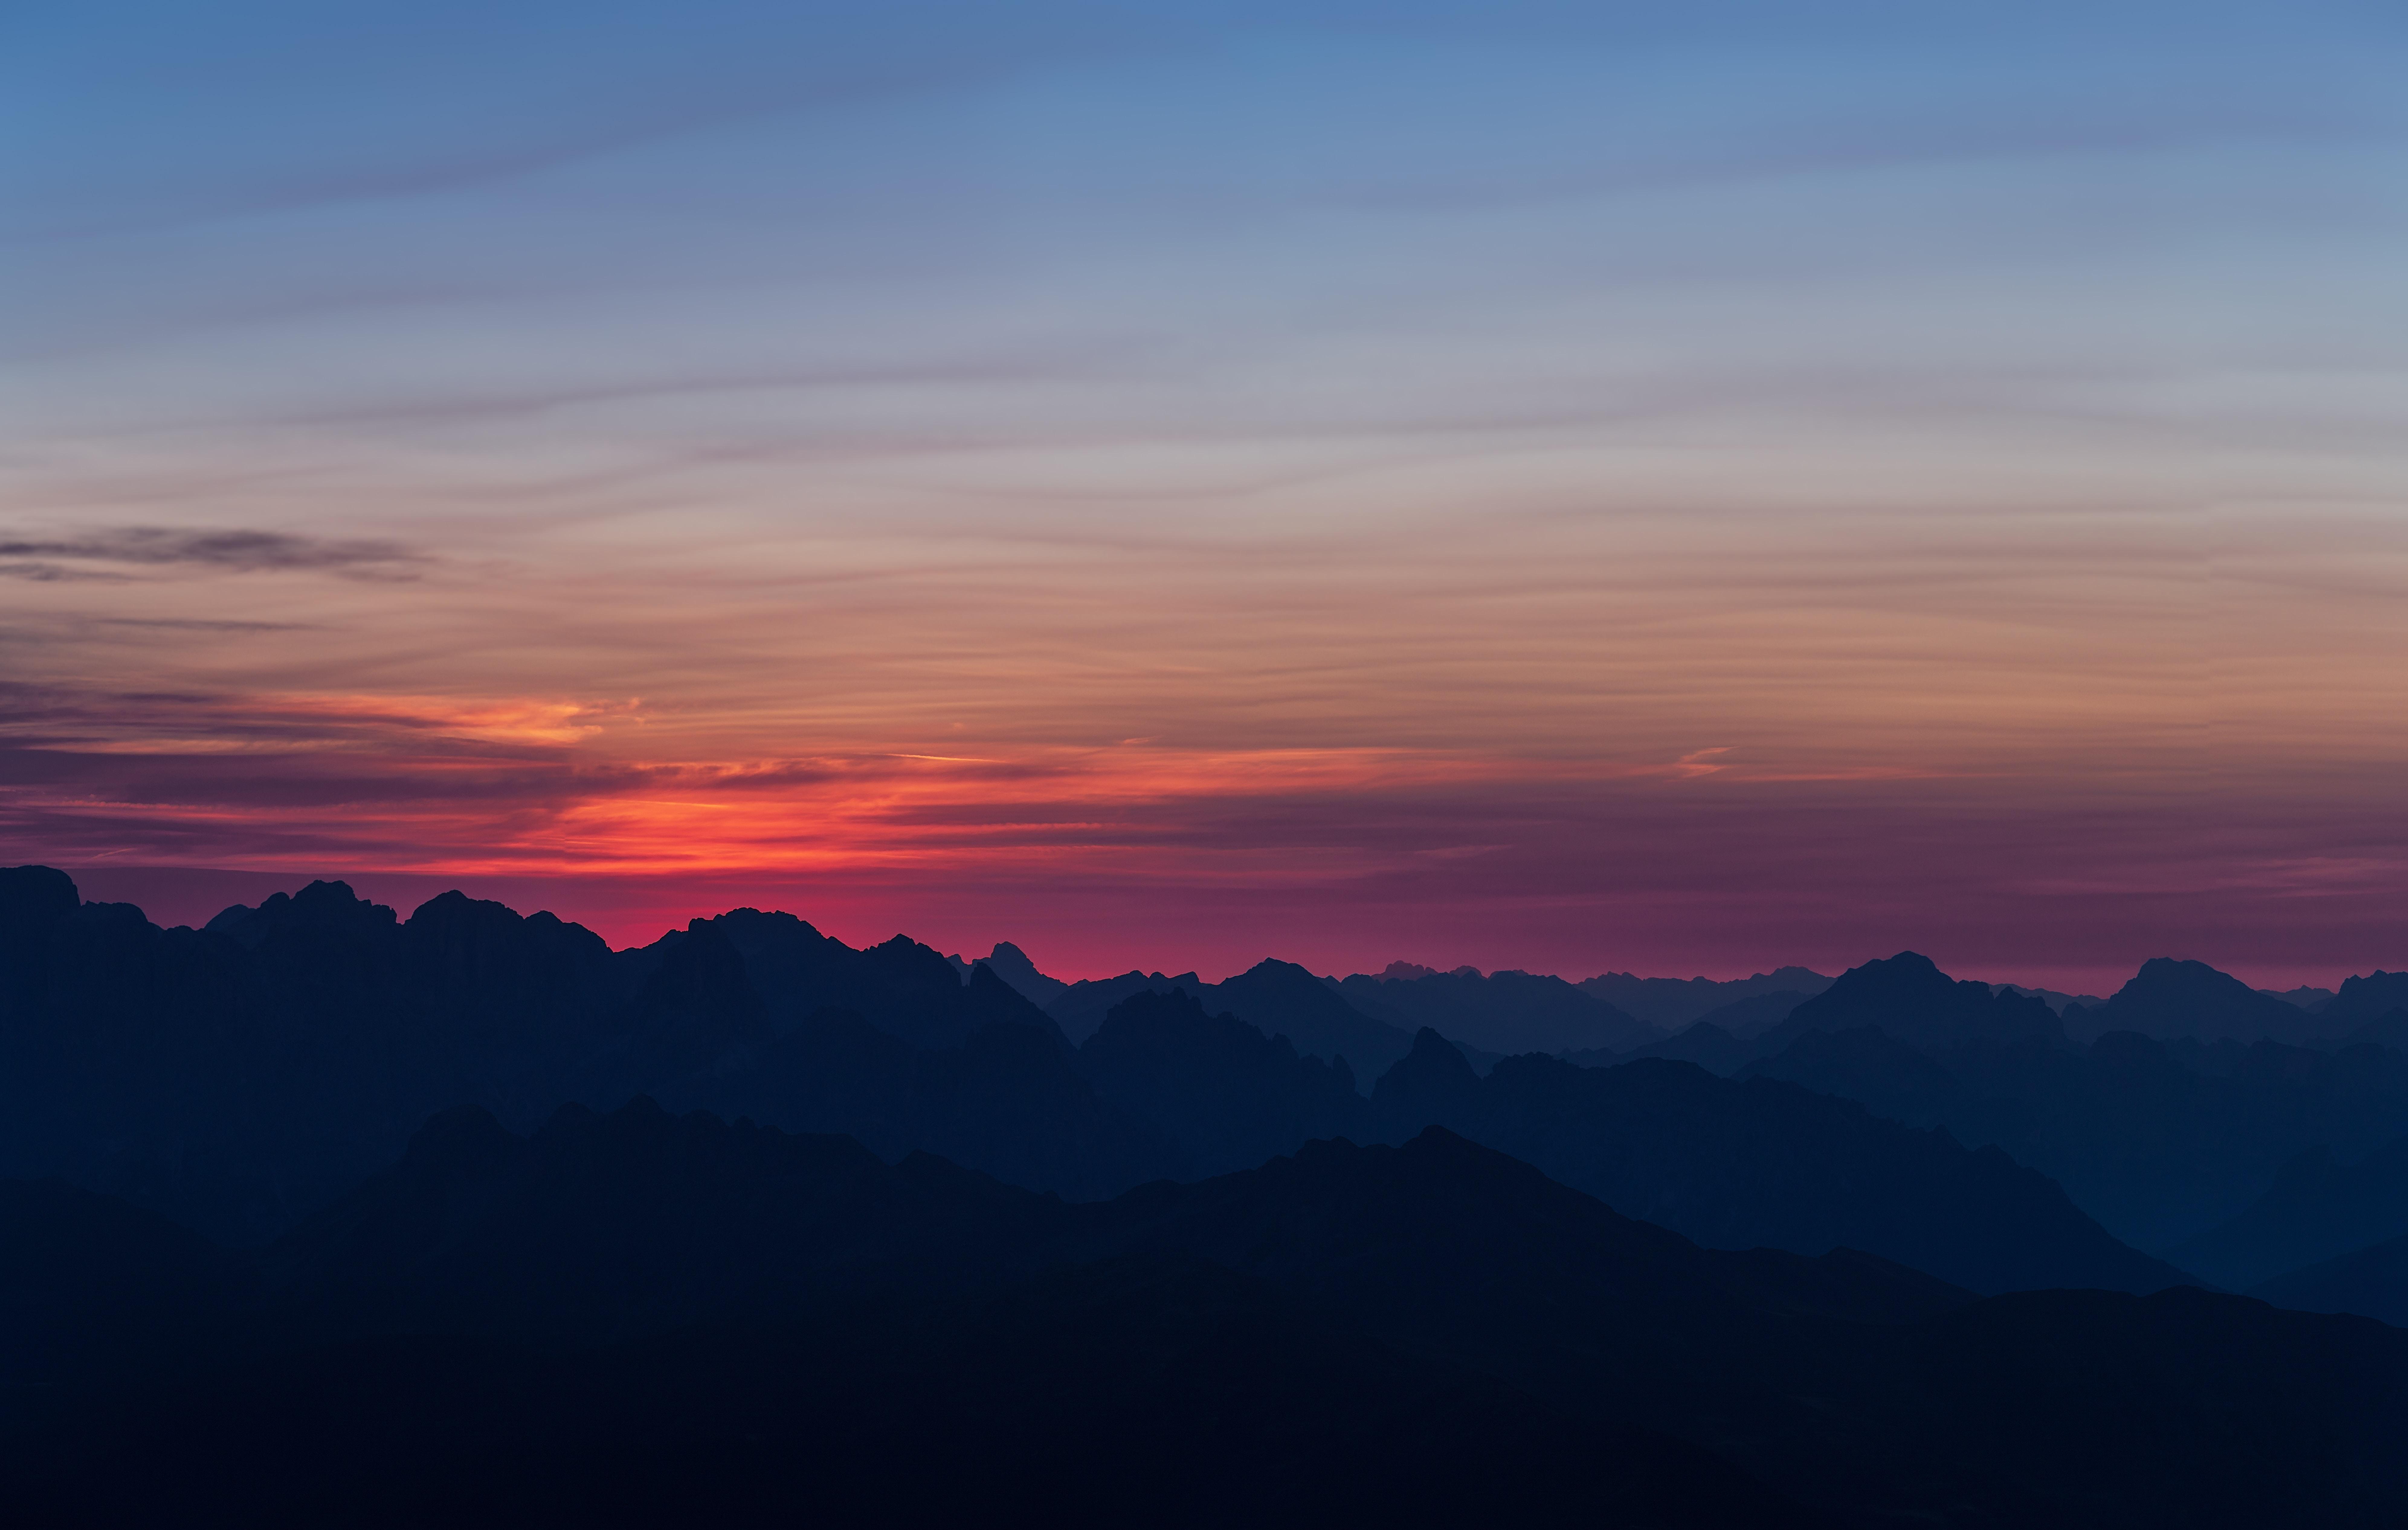 silhouette of mountain on sunset